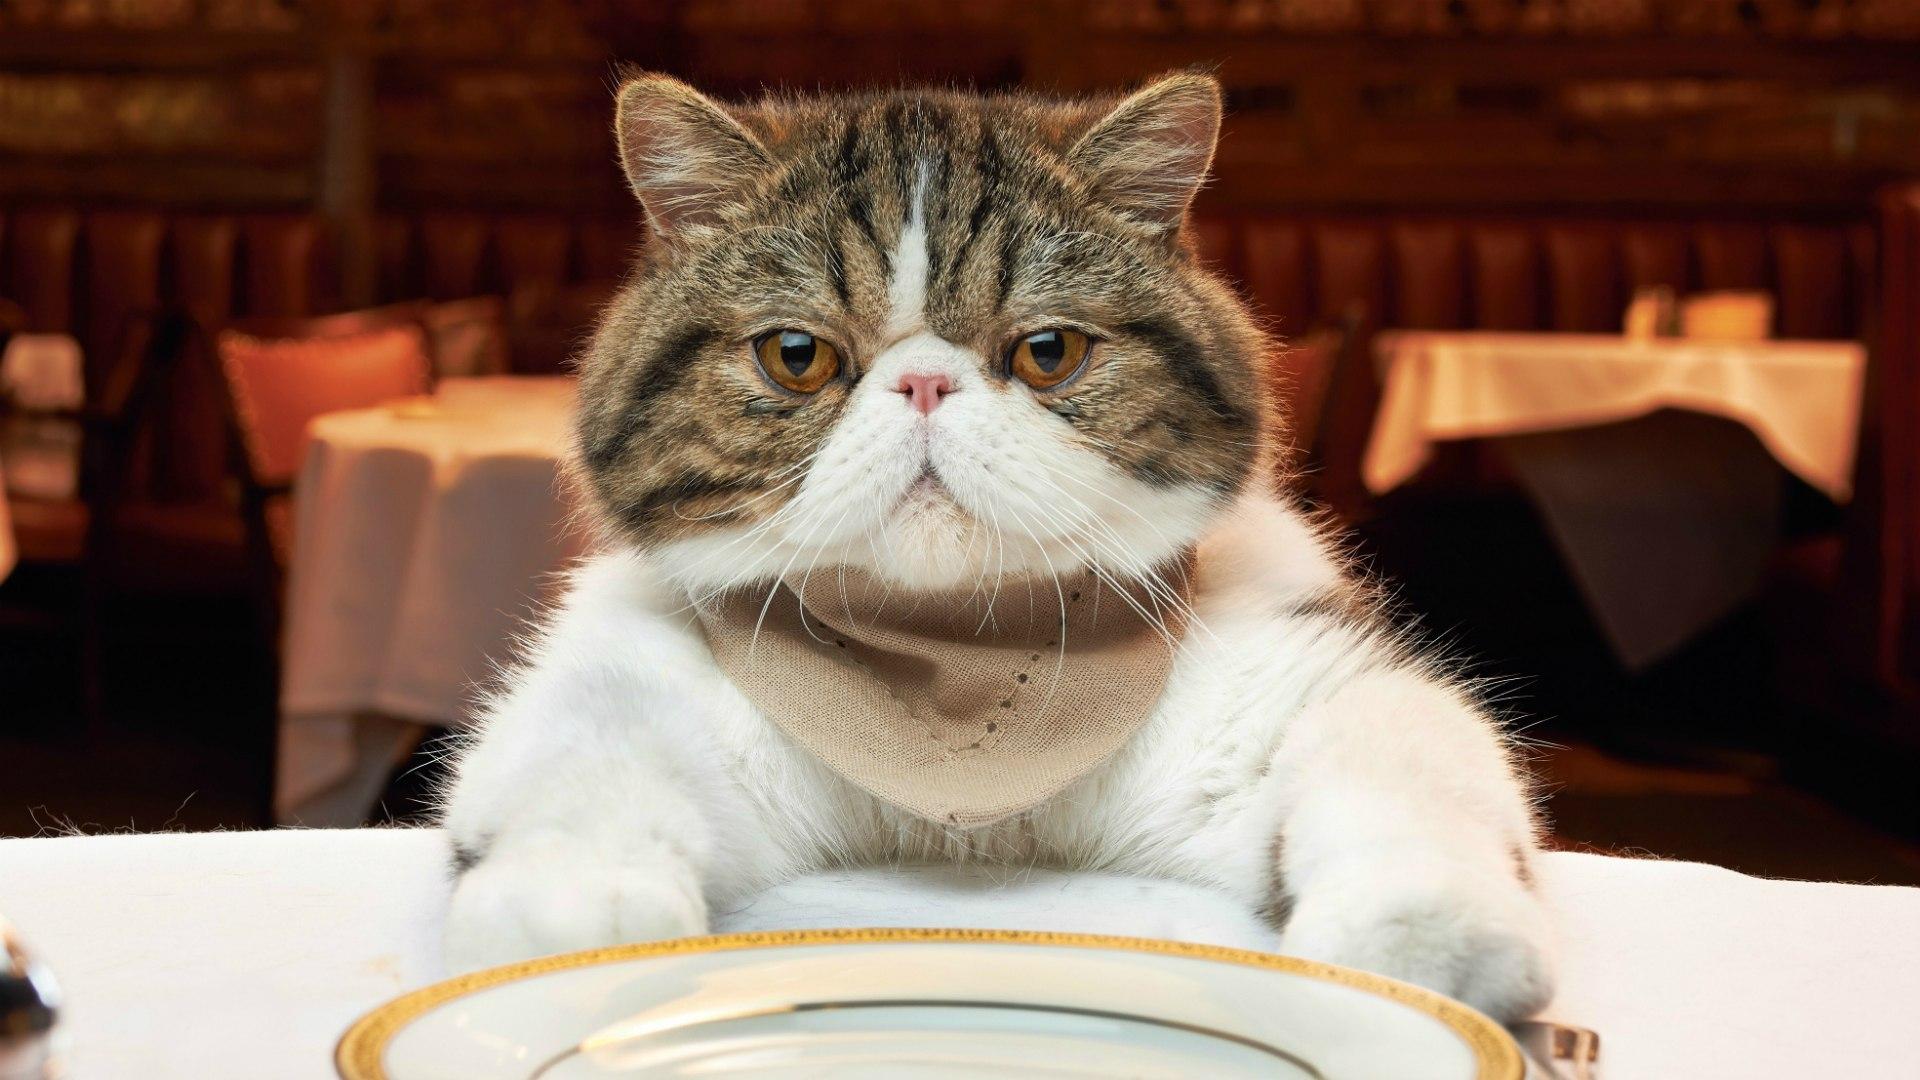 masada-oturan-kedi